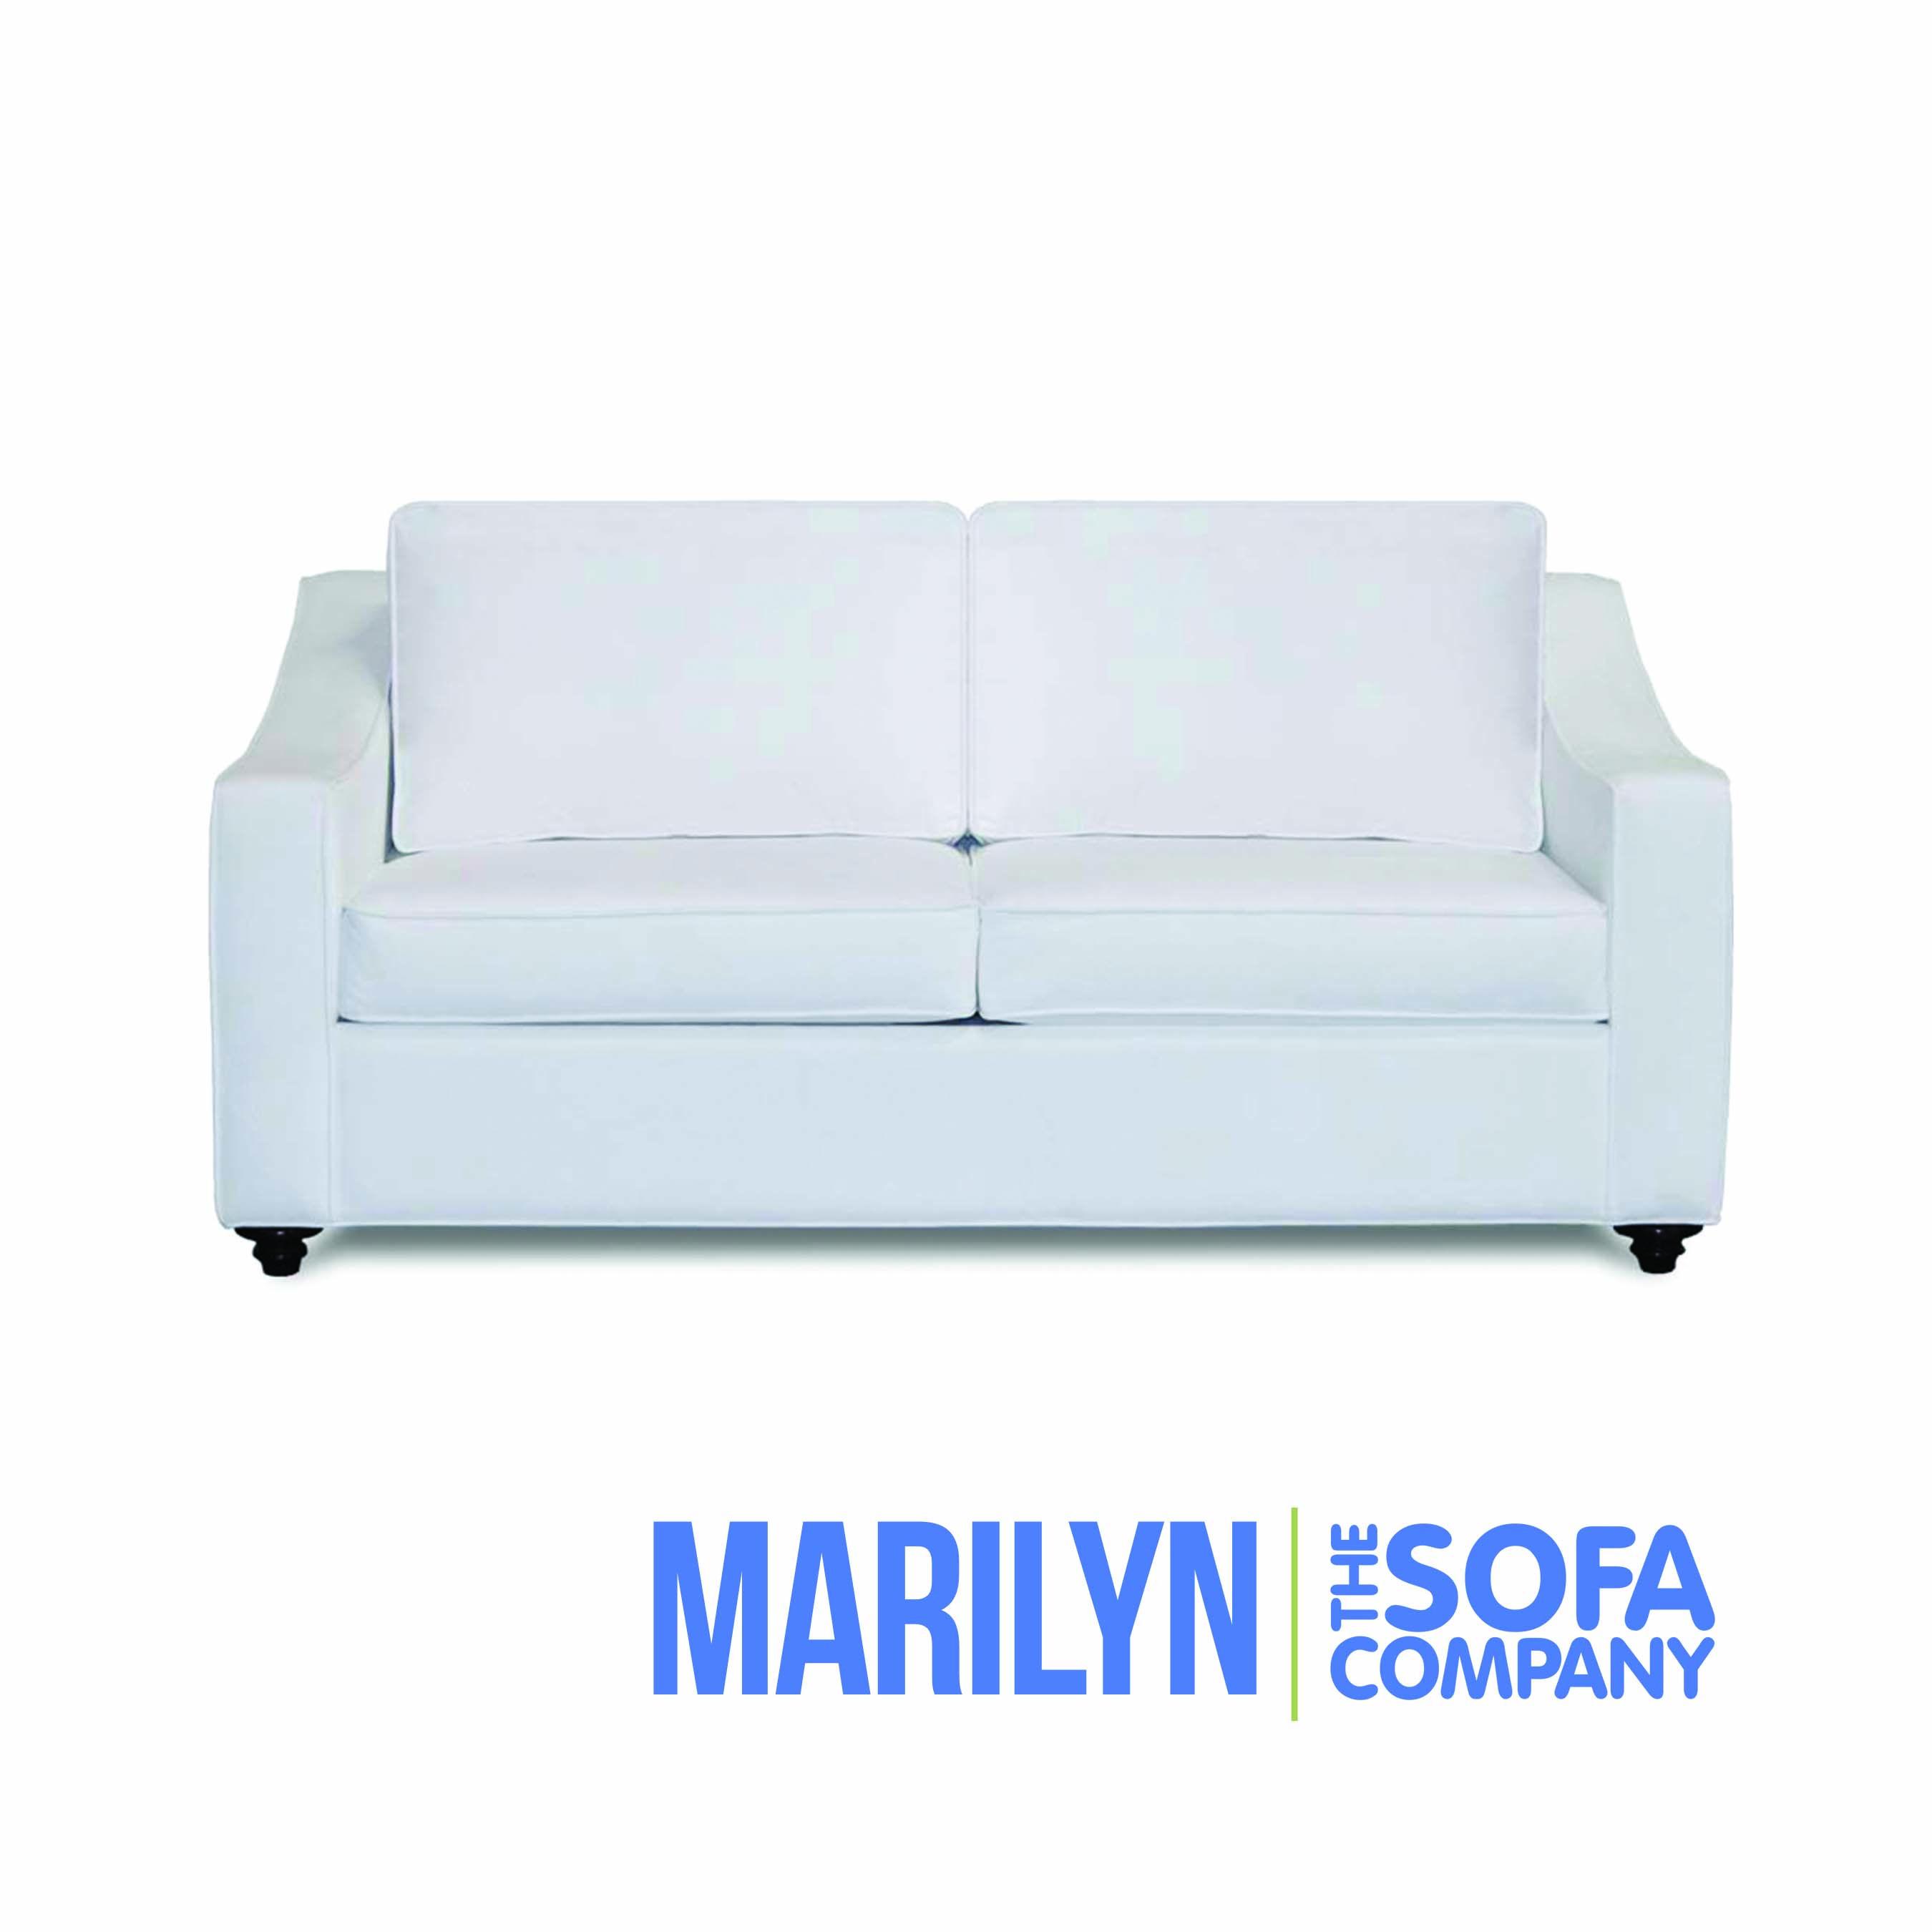 Marilyn Sofa Style By The Sofa Company Www.thesofaco.com